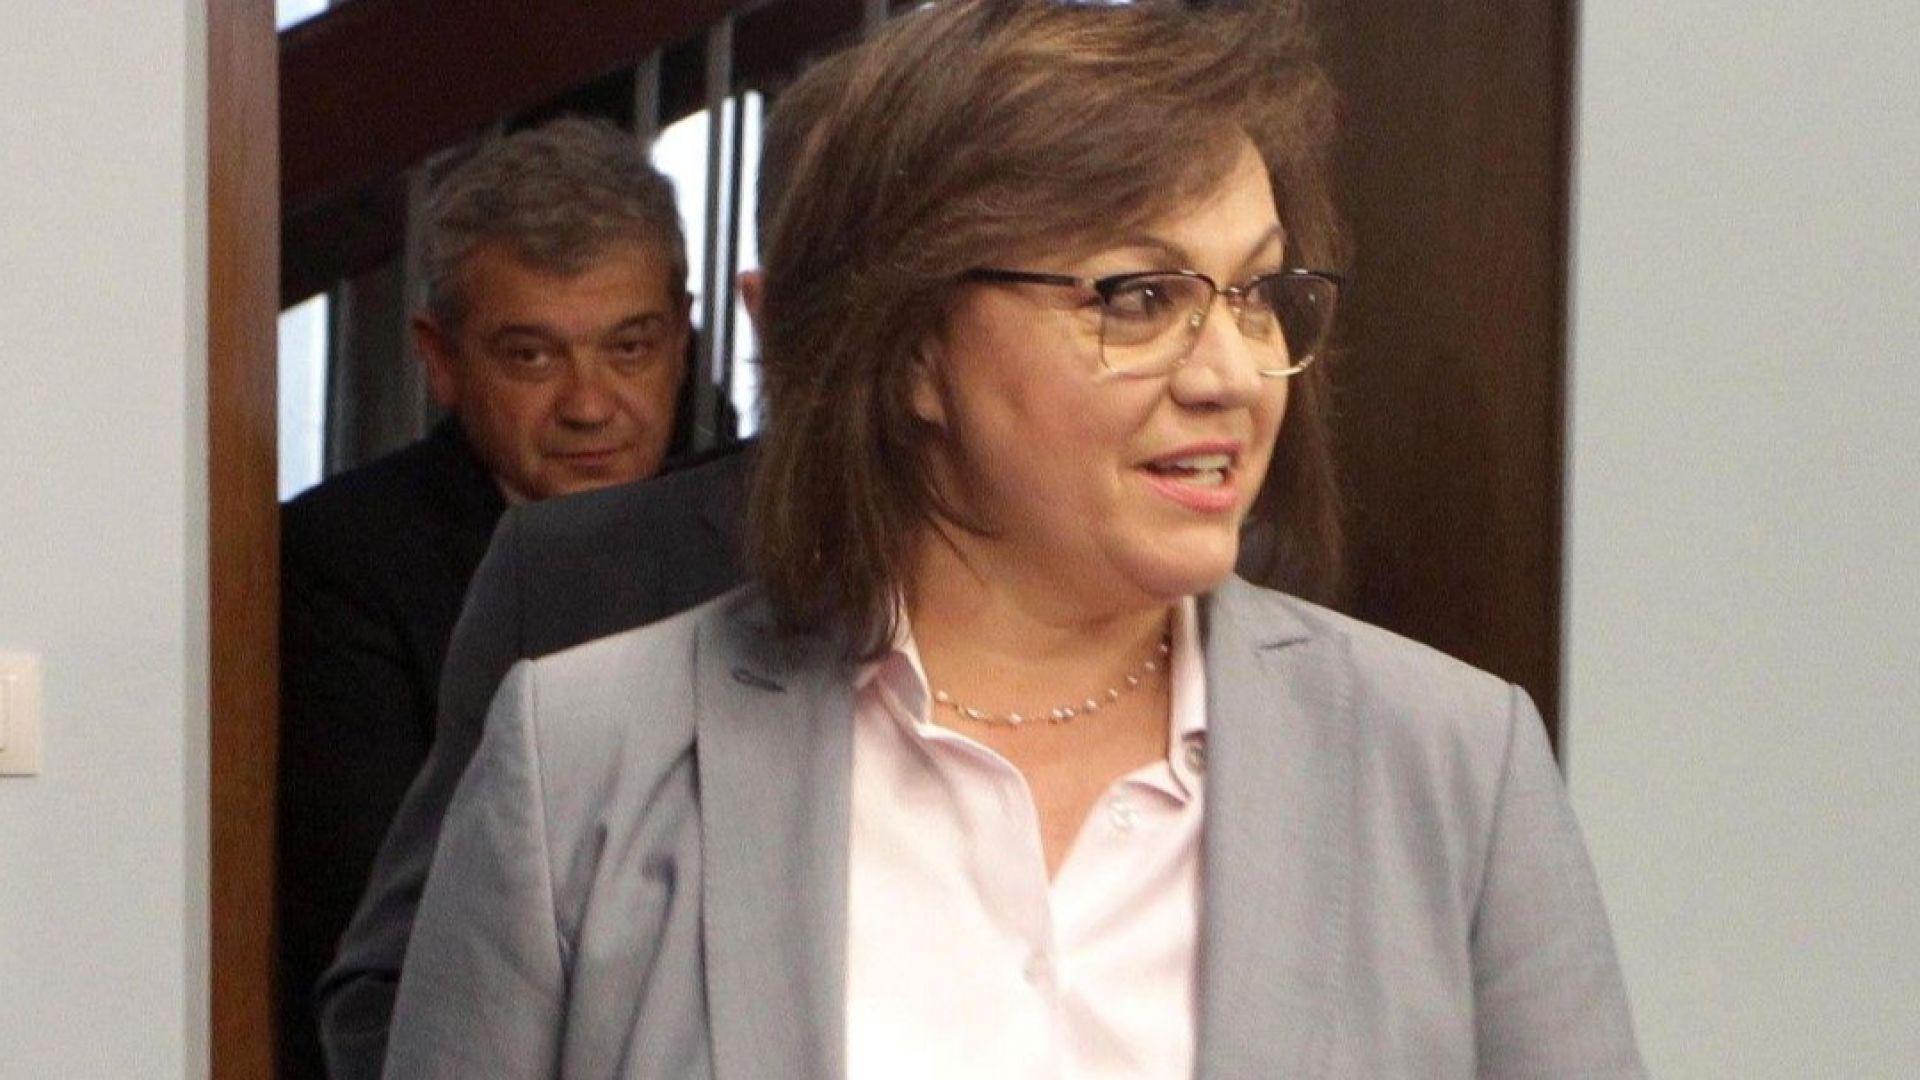 Нинова се оплака пред европейските посланици от репресии срещу поддръжници на БСП